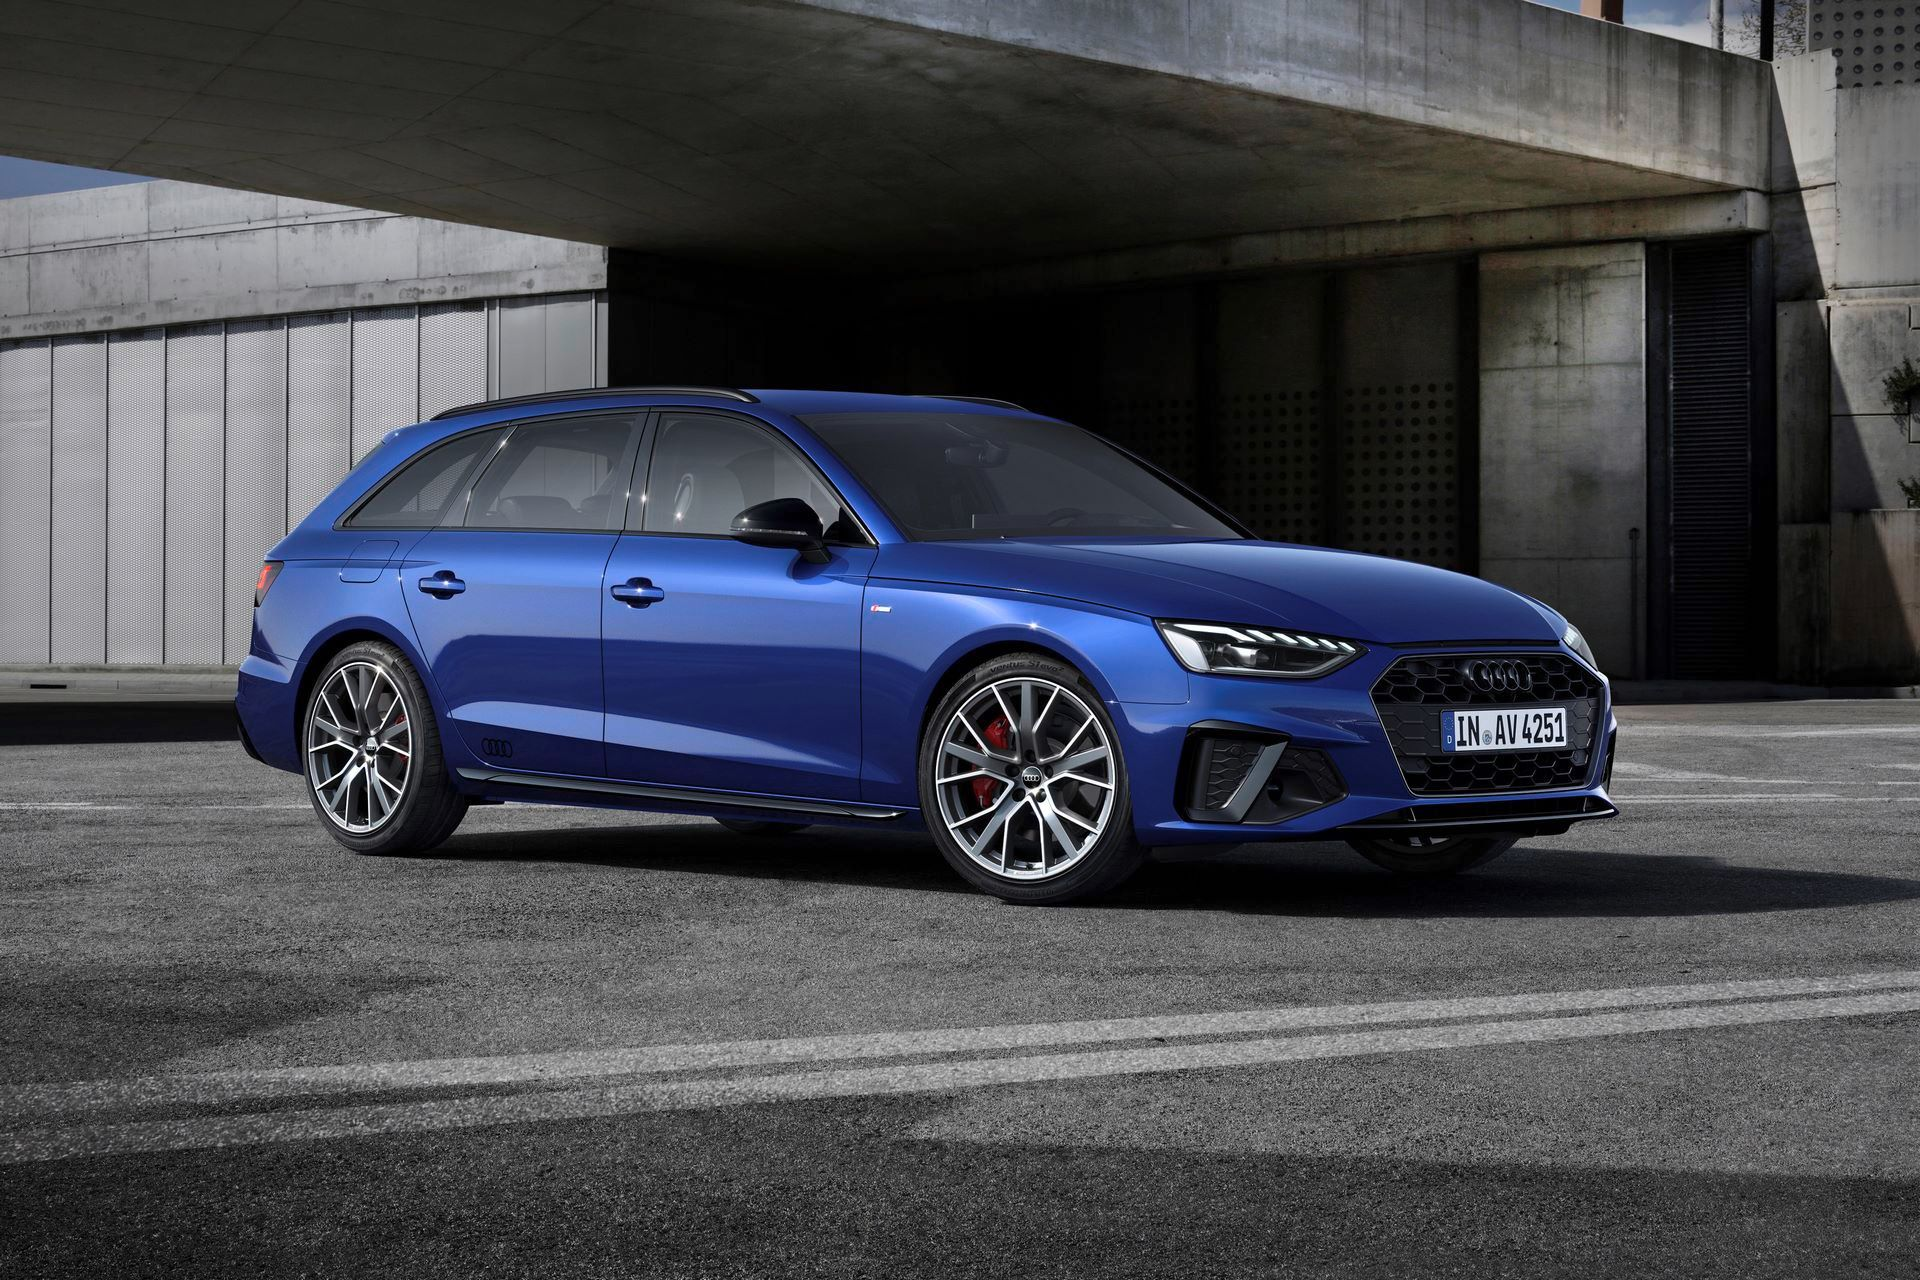 Audi-A4-A5-Q7-Q8-Competition-And-Competition-Plus-Trims-55